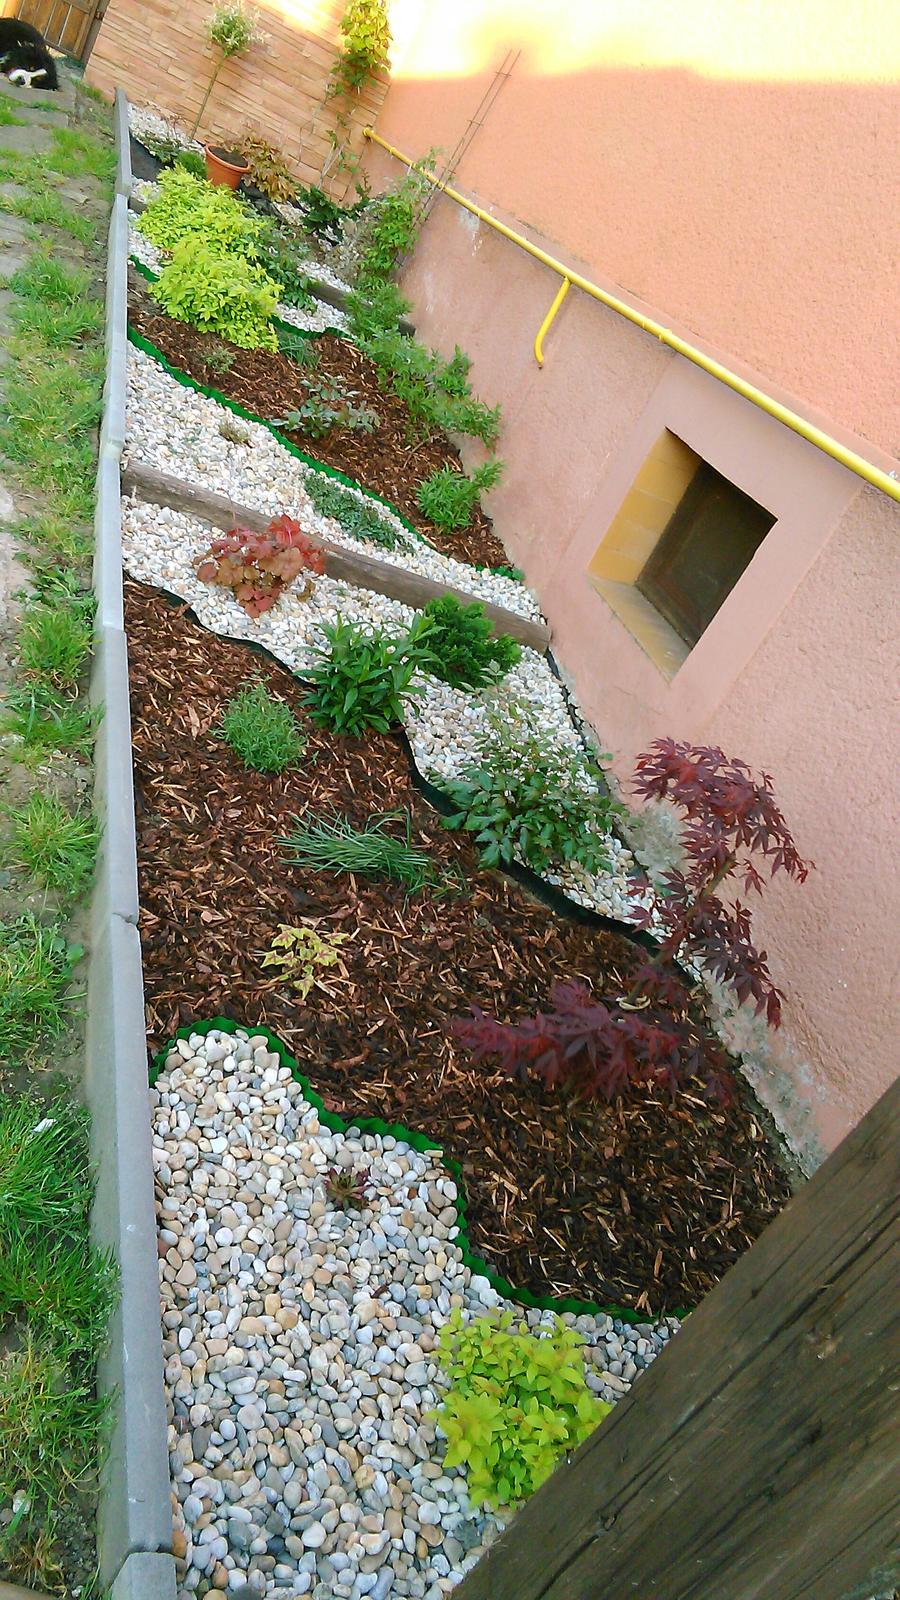 #zahrada  kusok nasej zelene :-) - Obrázok č. 2